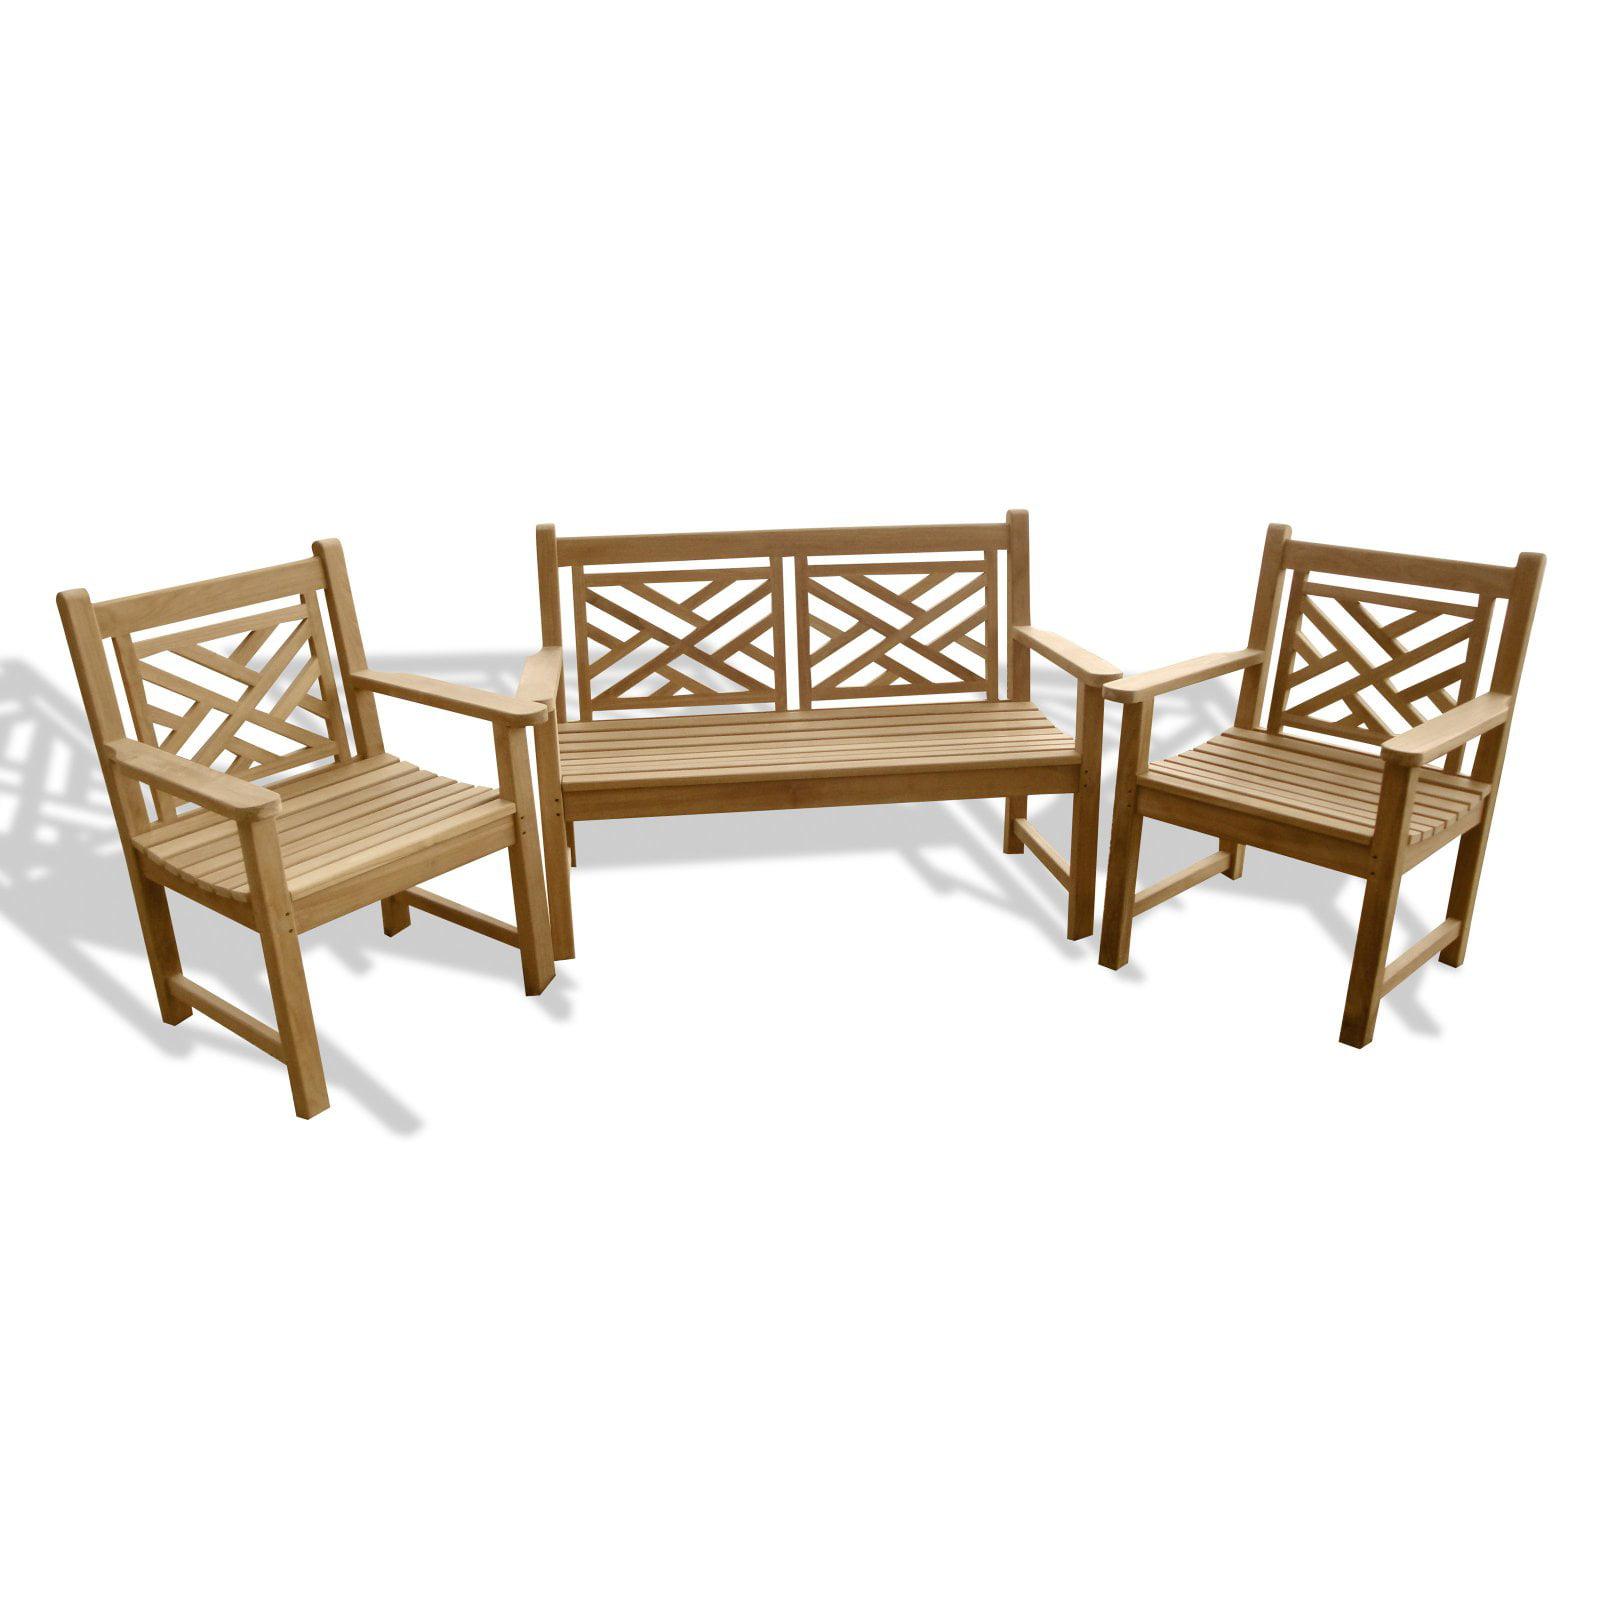 Windsor Teak Furniture Chippendale Teak 3 Piece Outdoor Conversation Set by Windsor Teak Furniture